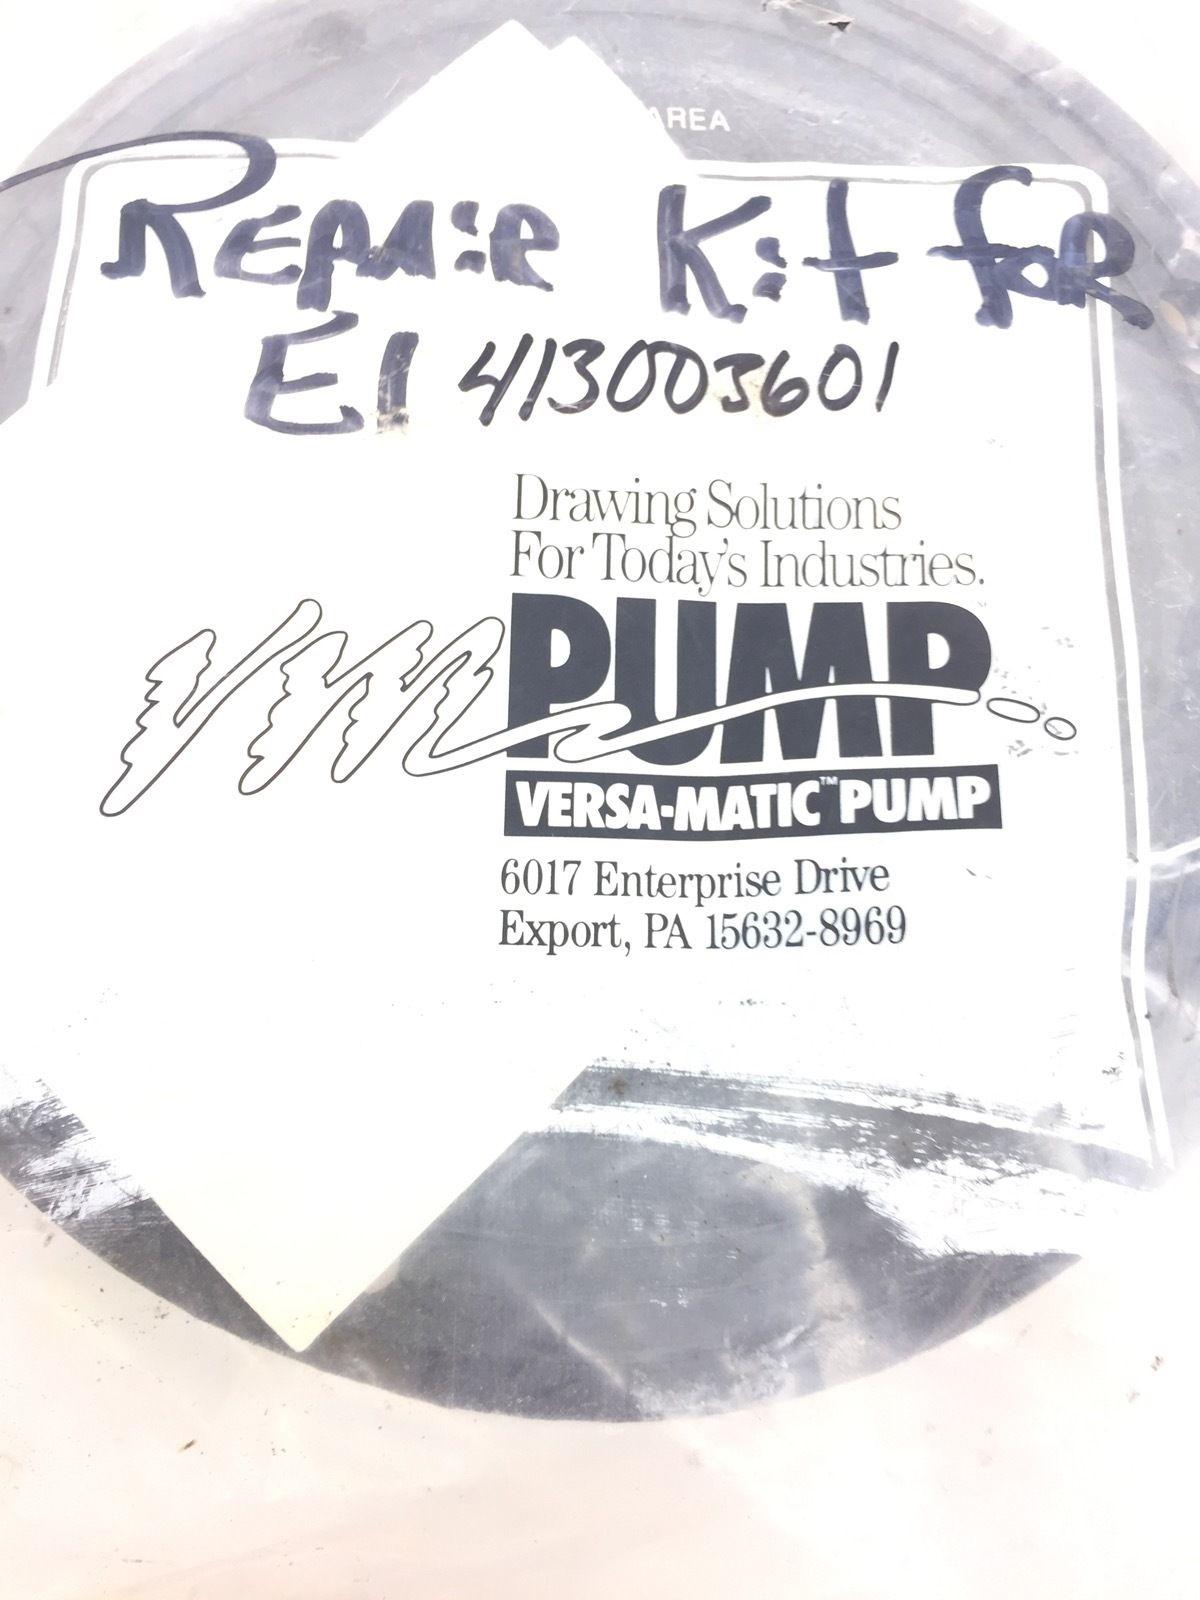 VERSA-MATIC 1� E-SERIES STAINLESS PUMP REPAIR KIT FOR E1413003601 NEW (H233) 1